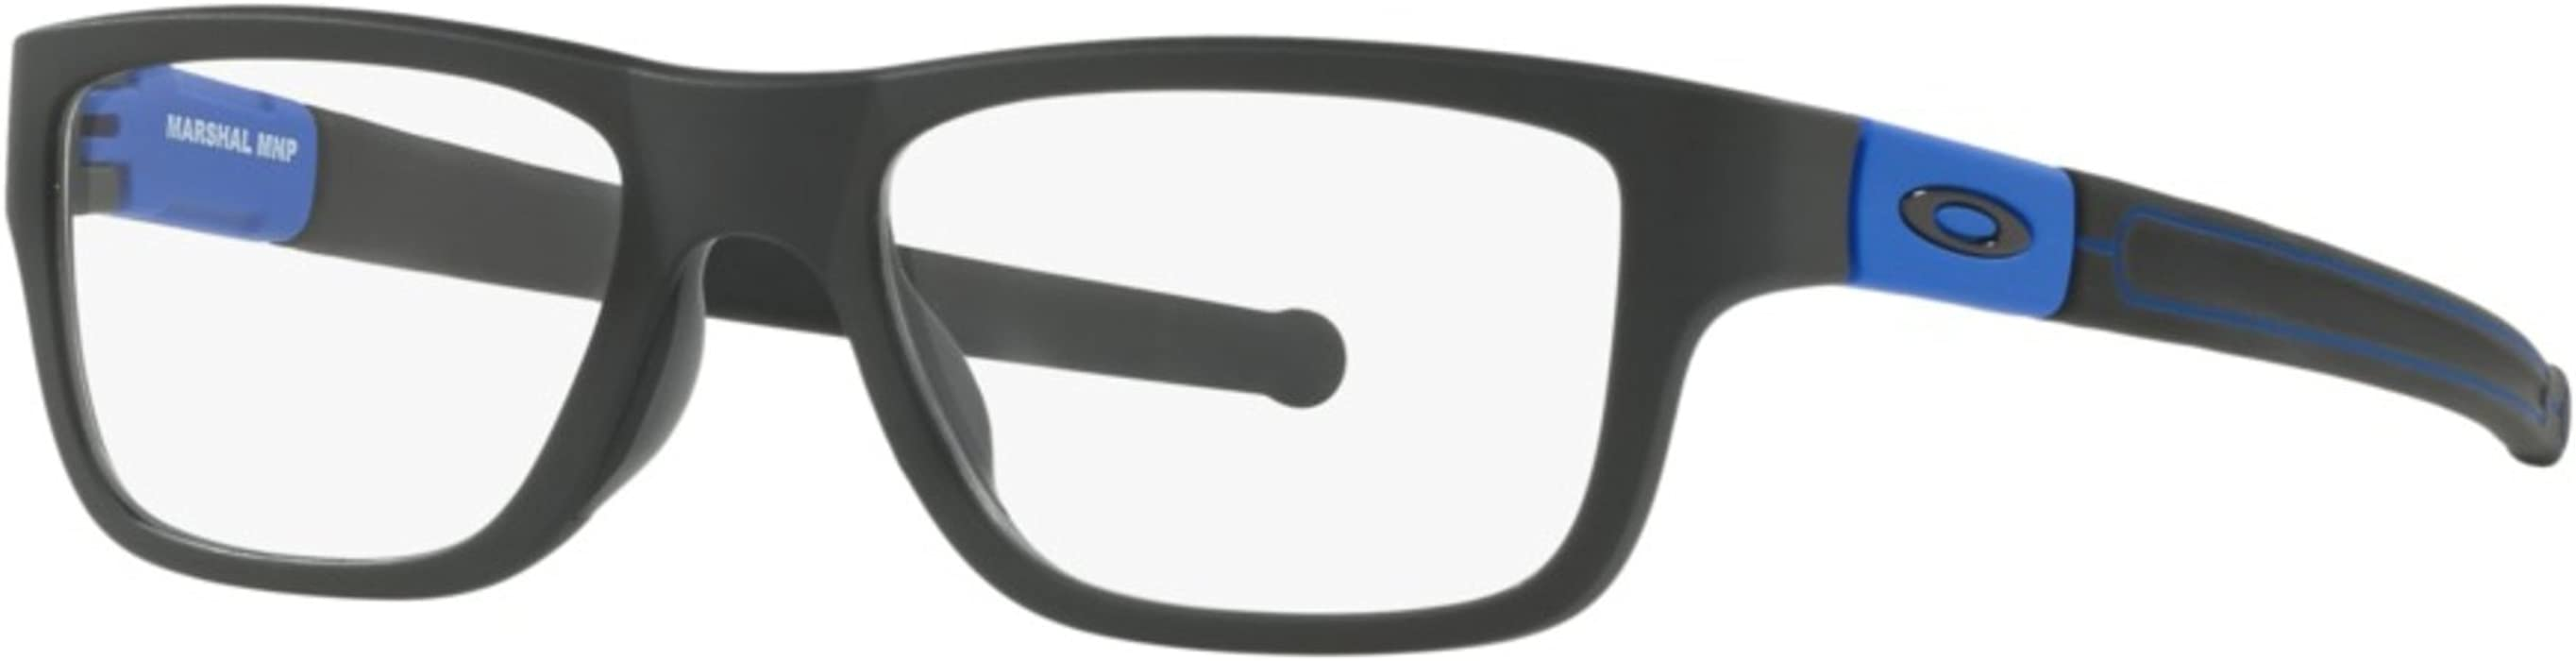 392cd976c6 Oakley MARSHAL COBALT COLLECTION OX8091-05 Eyeglasses Satin Black 51mm